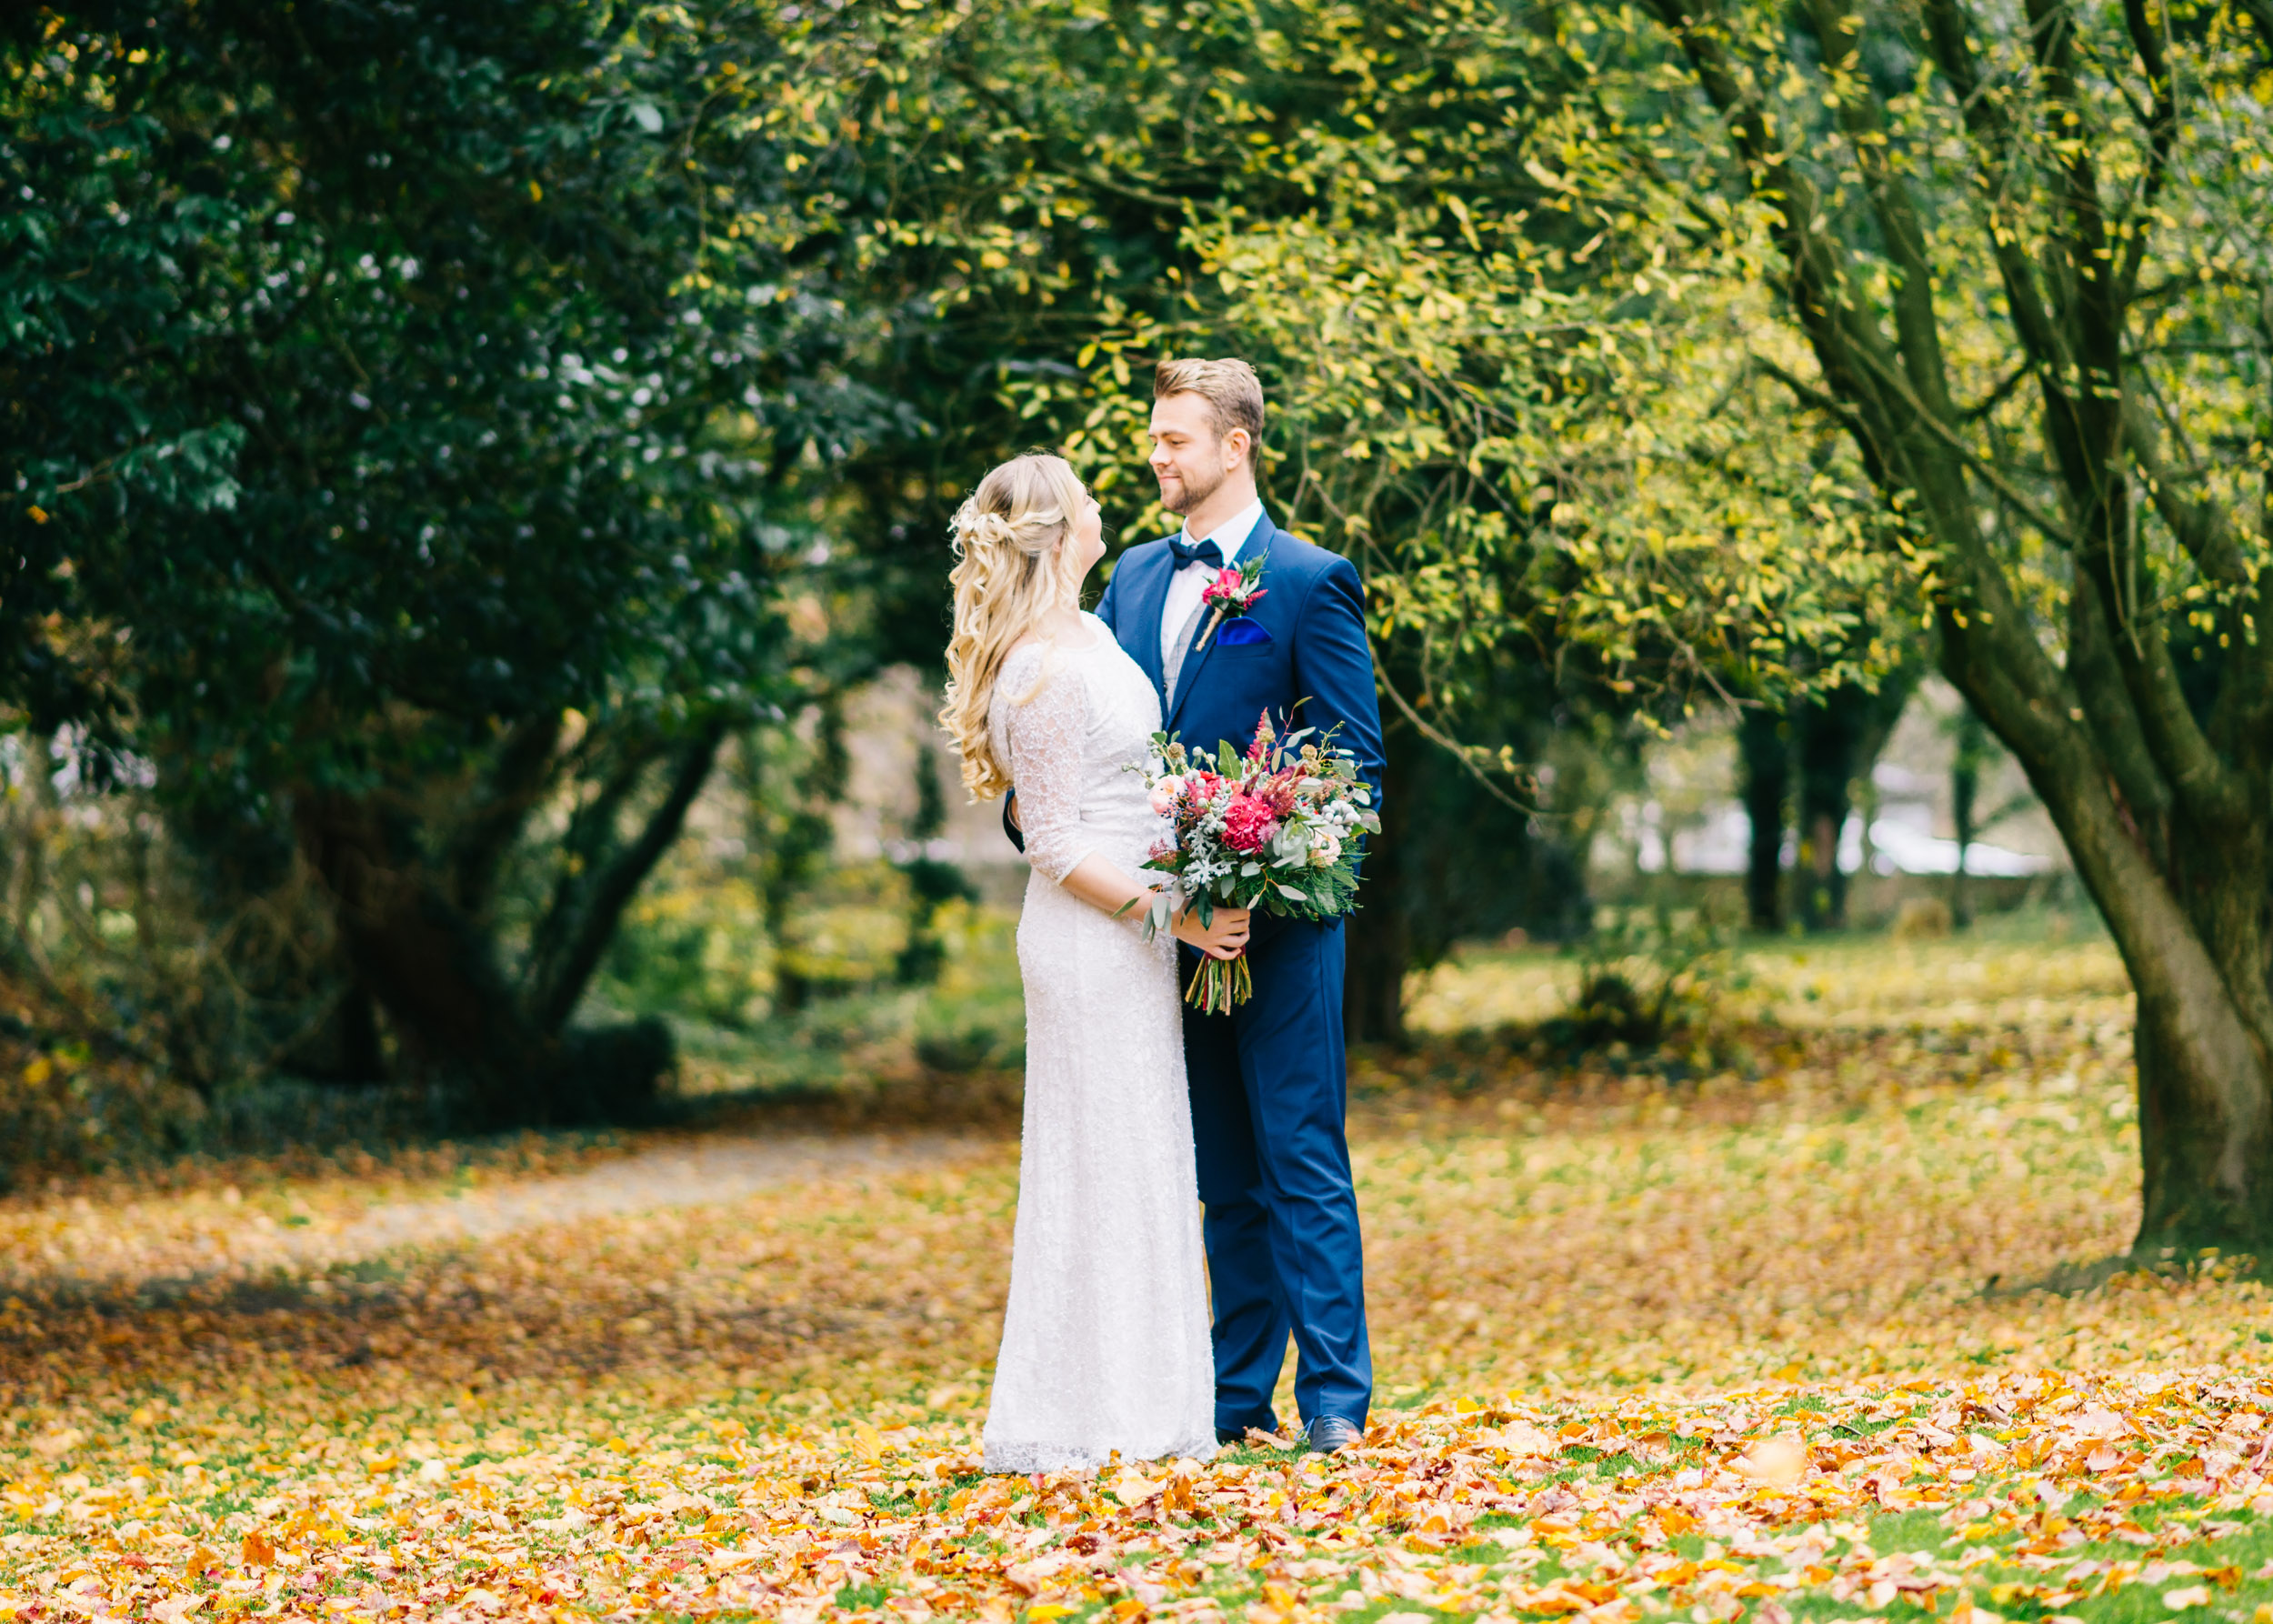 Mitton Hall, Wedding Venue Lancashire, Styled Wedding Workshop30